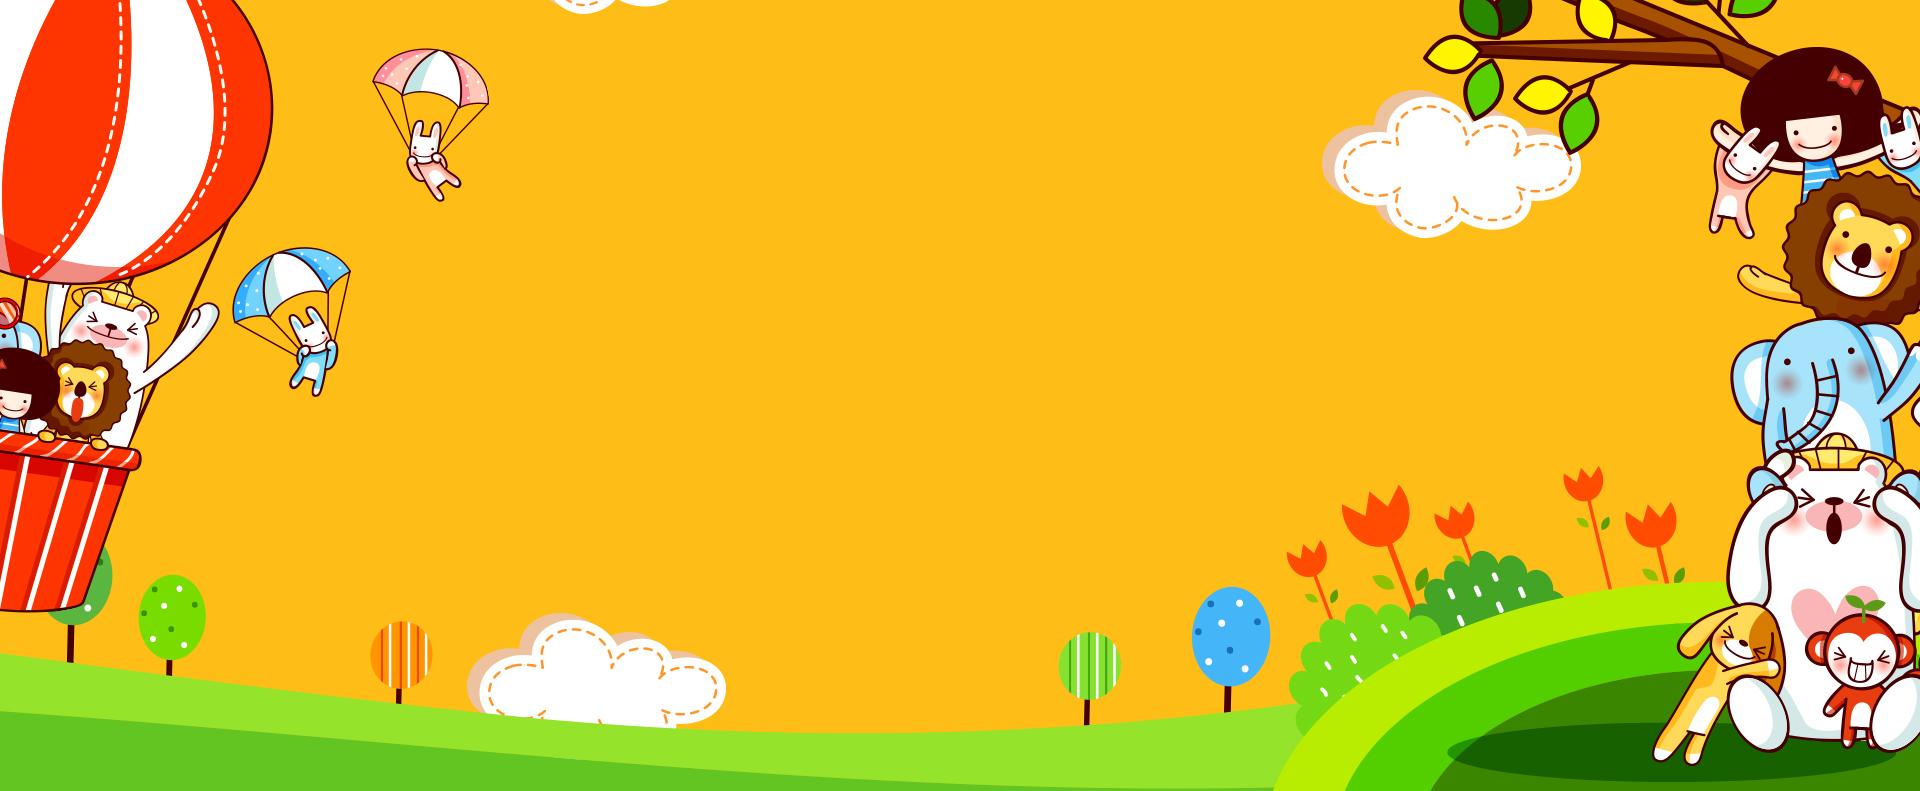 le carnaval de dessin simple jaune de banni u00e8re  u00e9cole l